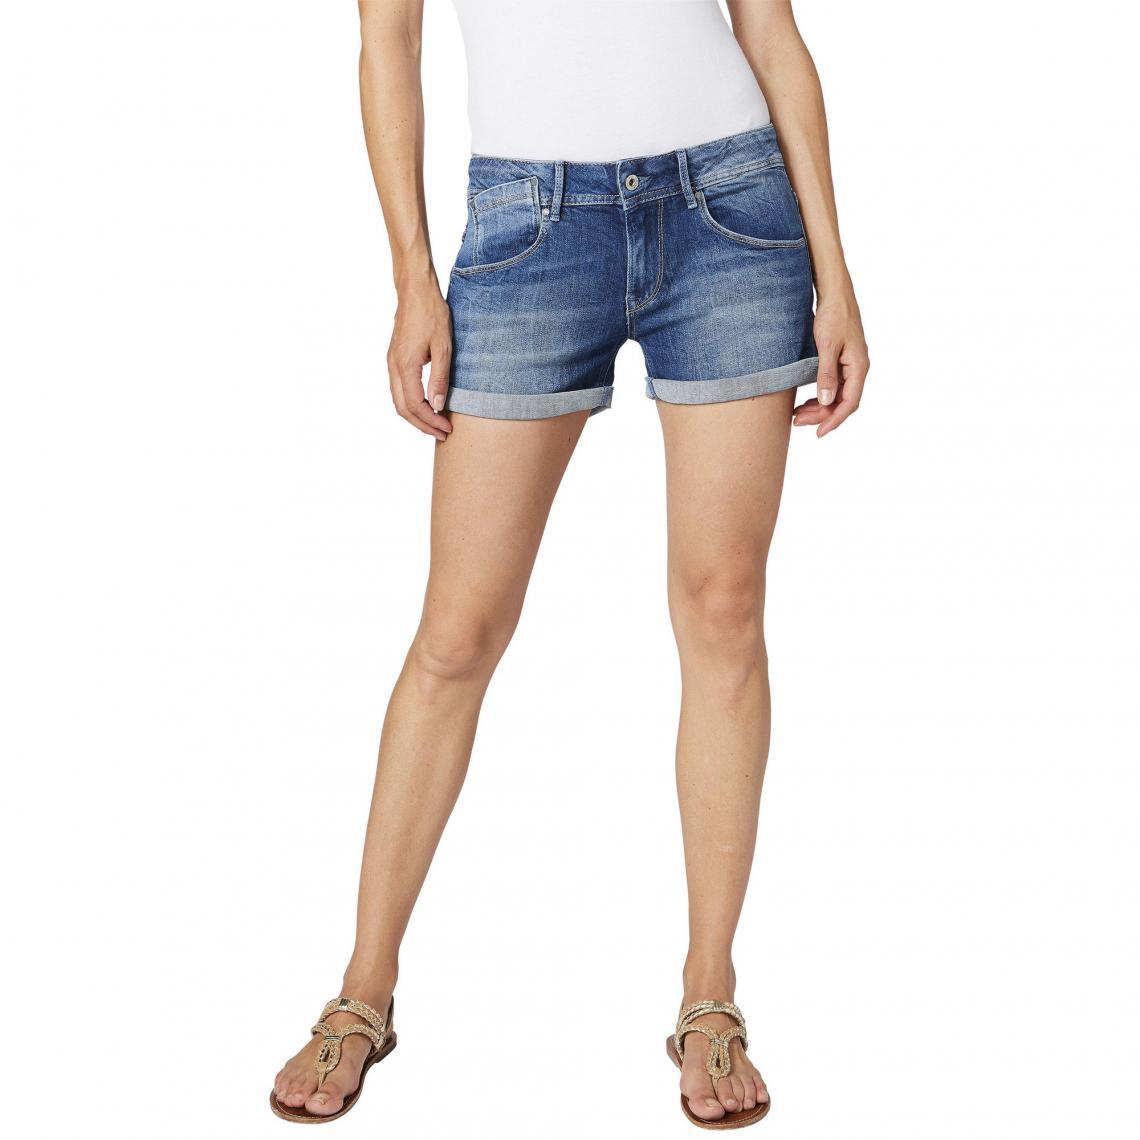 874f9dd9667 Bleu 3suisses Jeans Pepe Short Denim Femme qYwzIpI